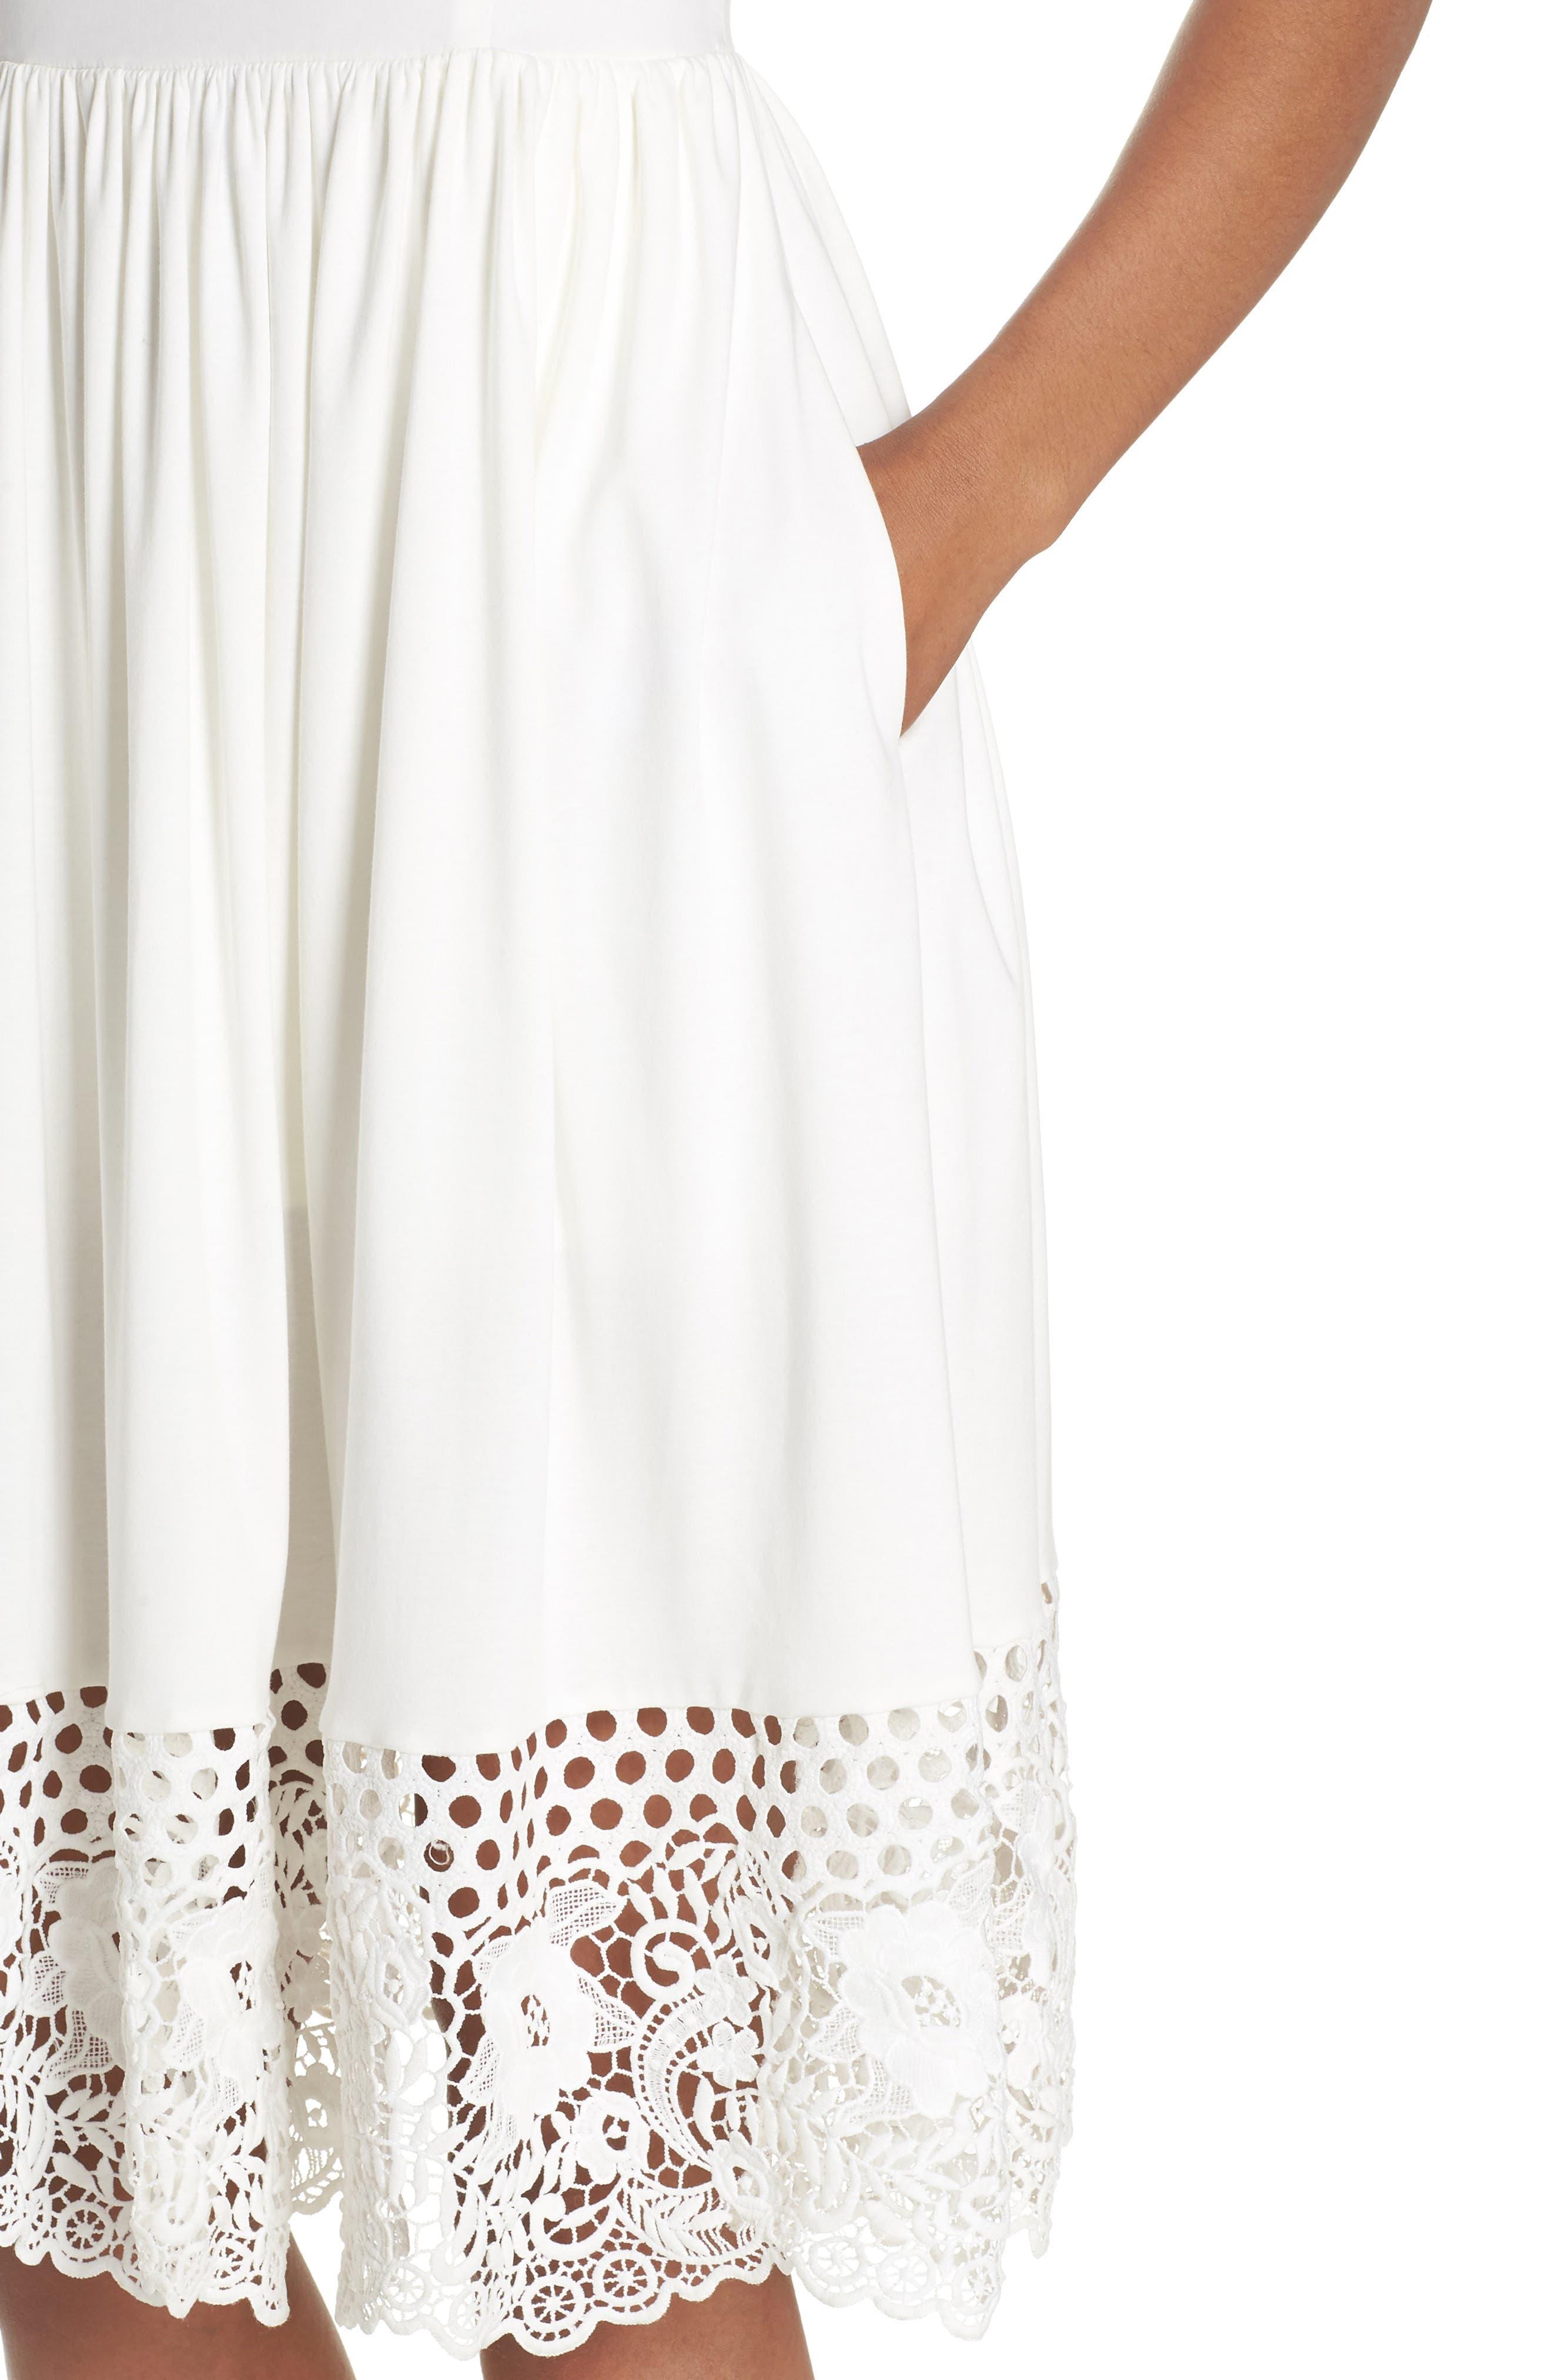 Salerno Lace Trim Jersey Dress,                             Alternate thumbnail 4, color,                             106